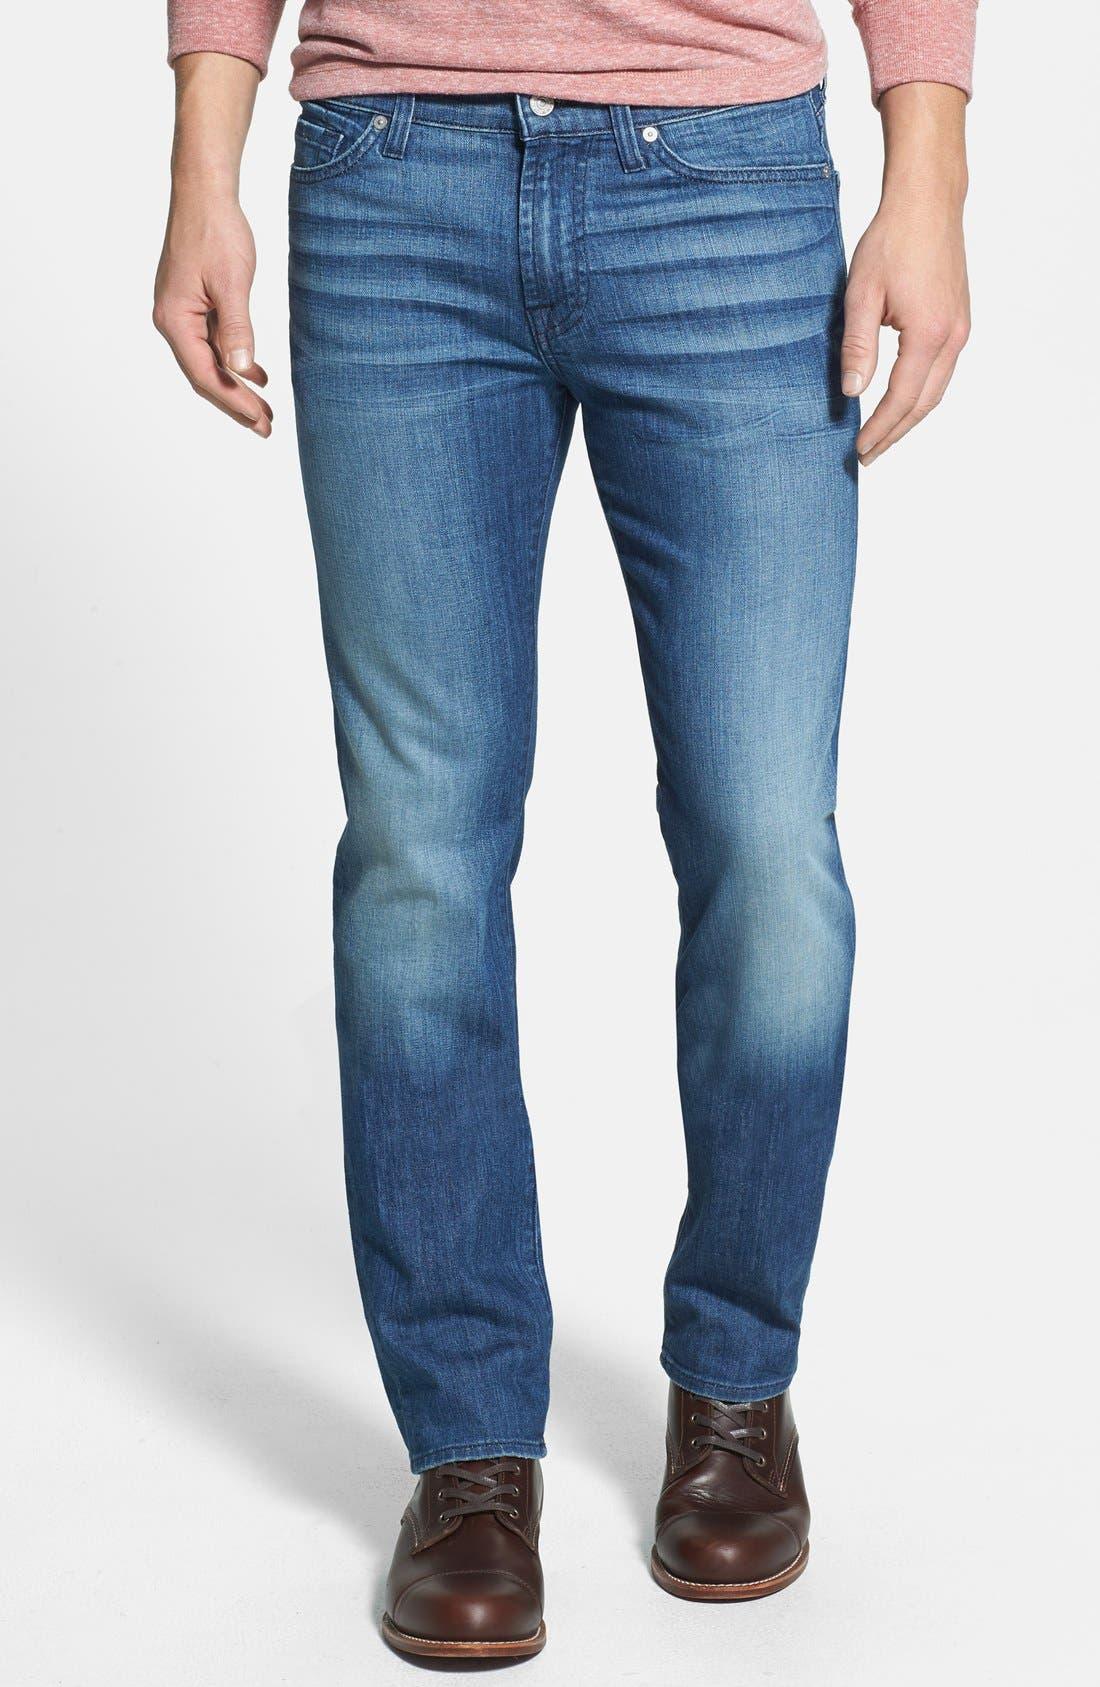 Main Image - 7 For All Mankind® 'Slimmy' Slim Straight Leg Jeans (Delridge Indigo)